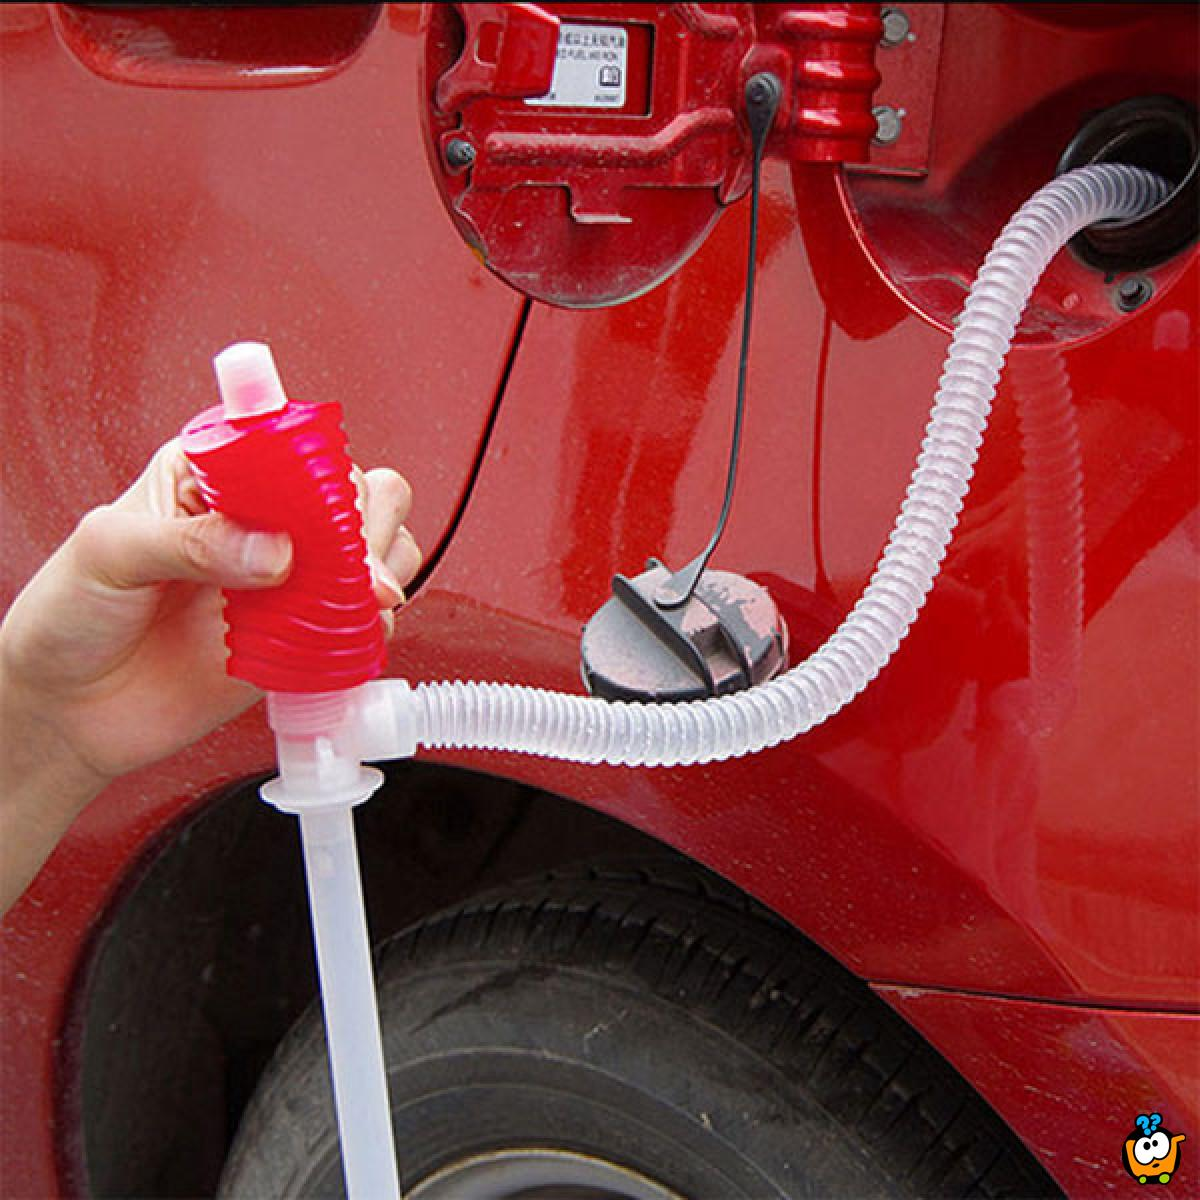 Ručna pumpa za prenos tečnosti